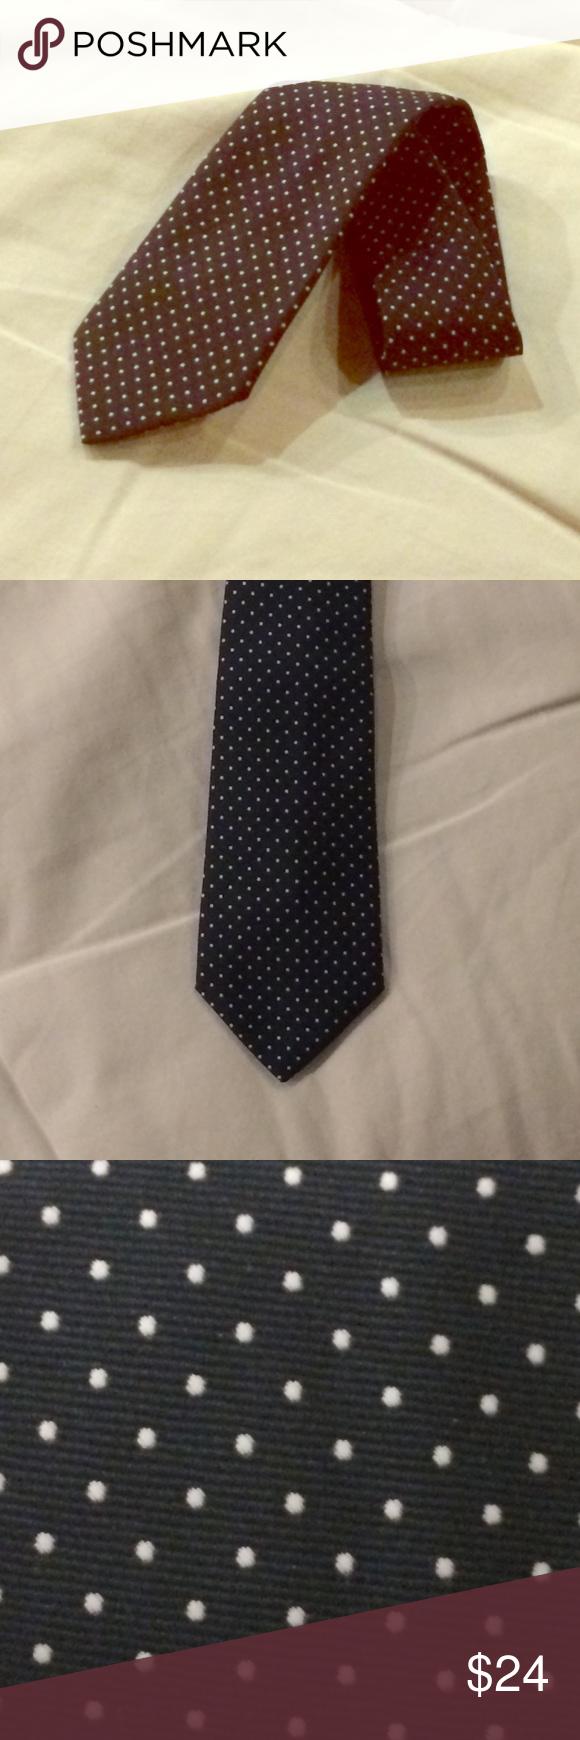 5b68a8f60845 Dark Blue Tie w/ Dots Beau Brummell Tie White dots over dark blue Classic  width, not slim Beau Brummell Accessories Ties